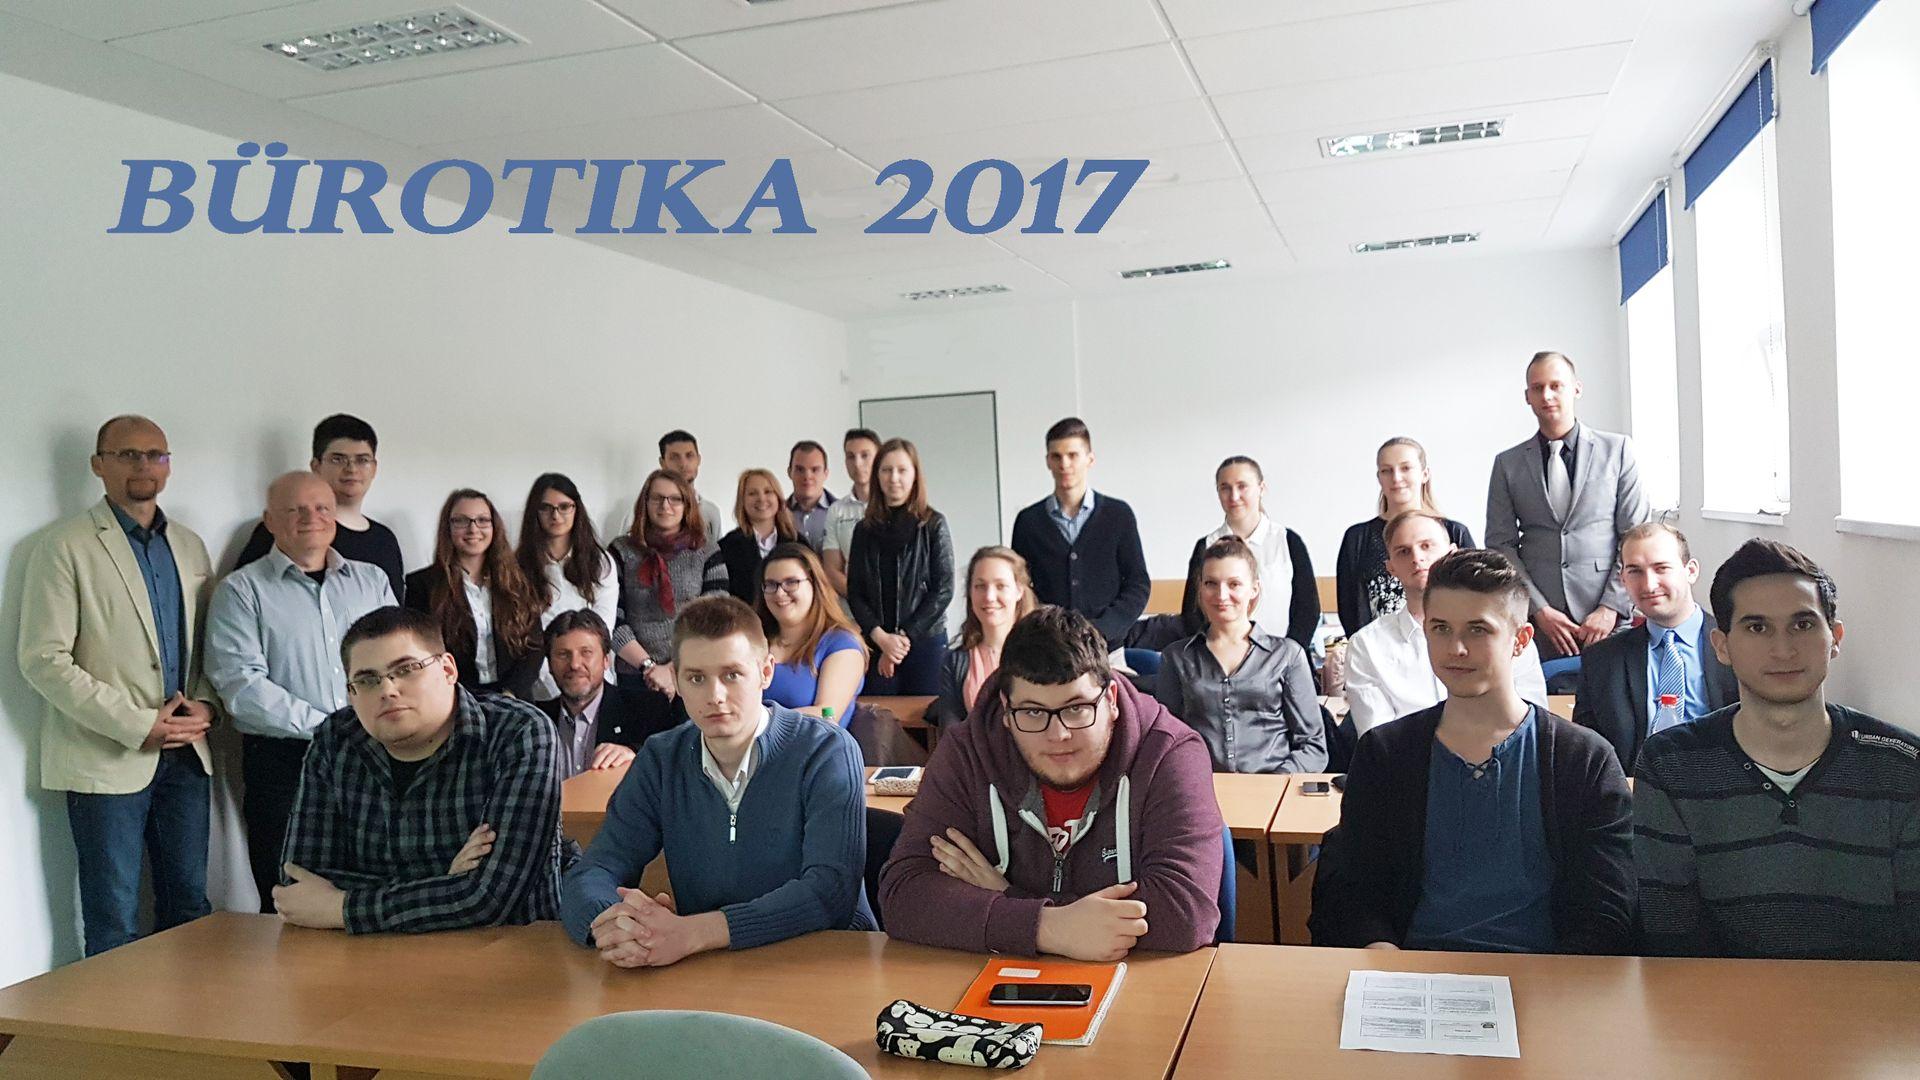 rsFHD_burotika_2017_4.jpg